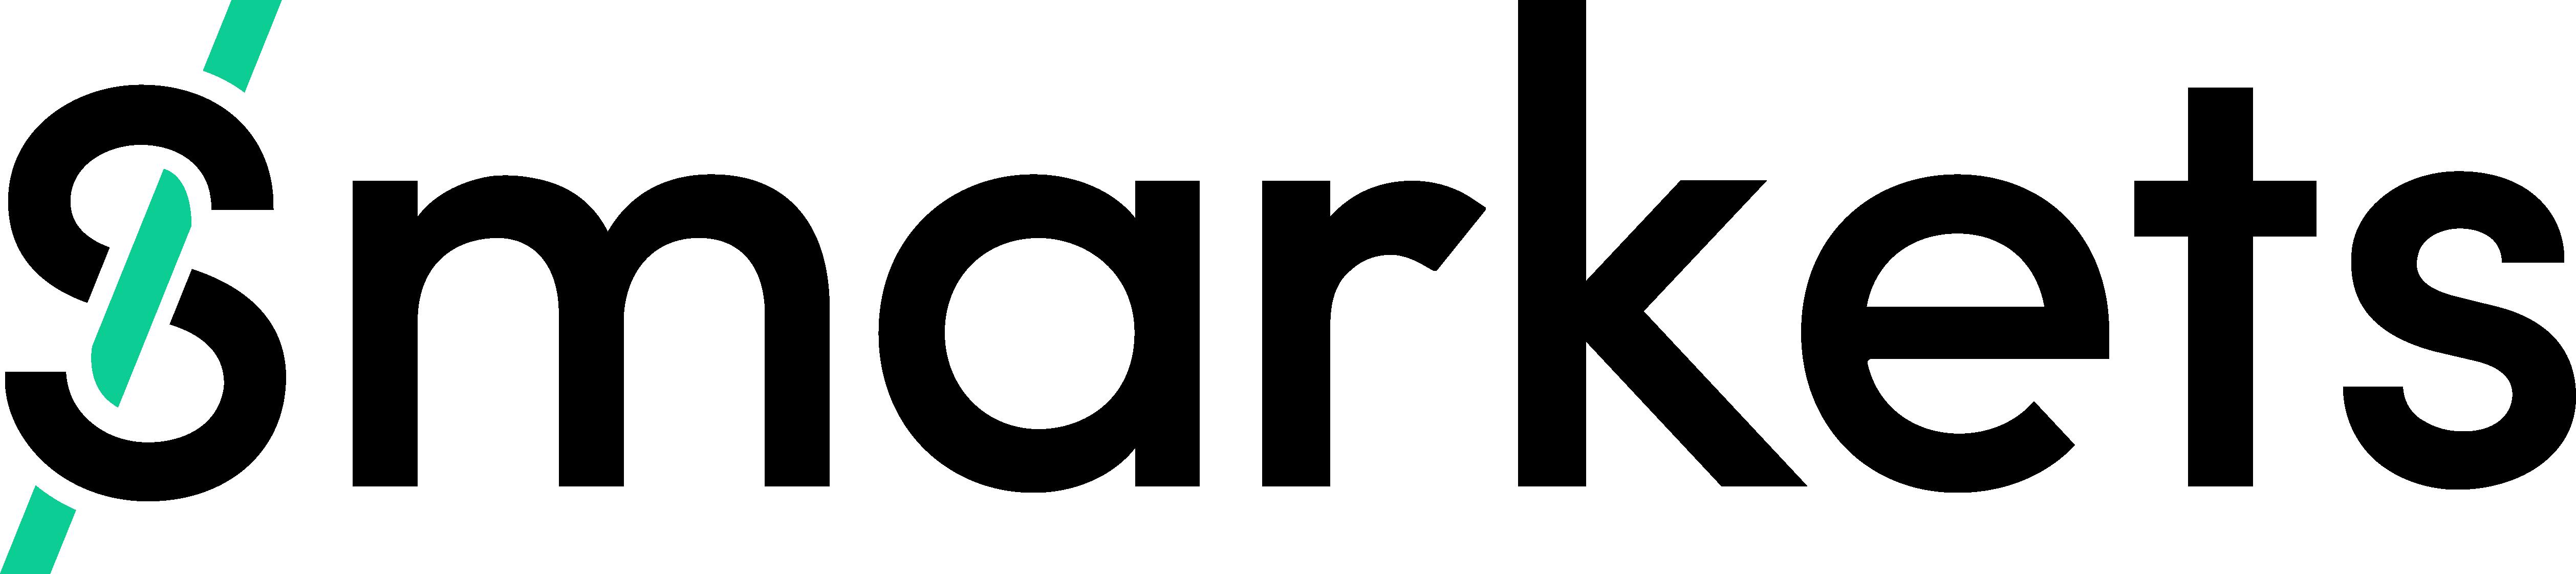 ladder.io logo